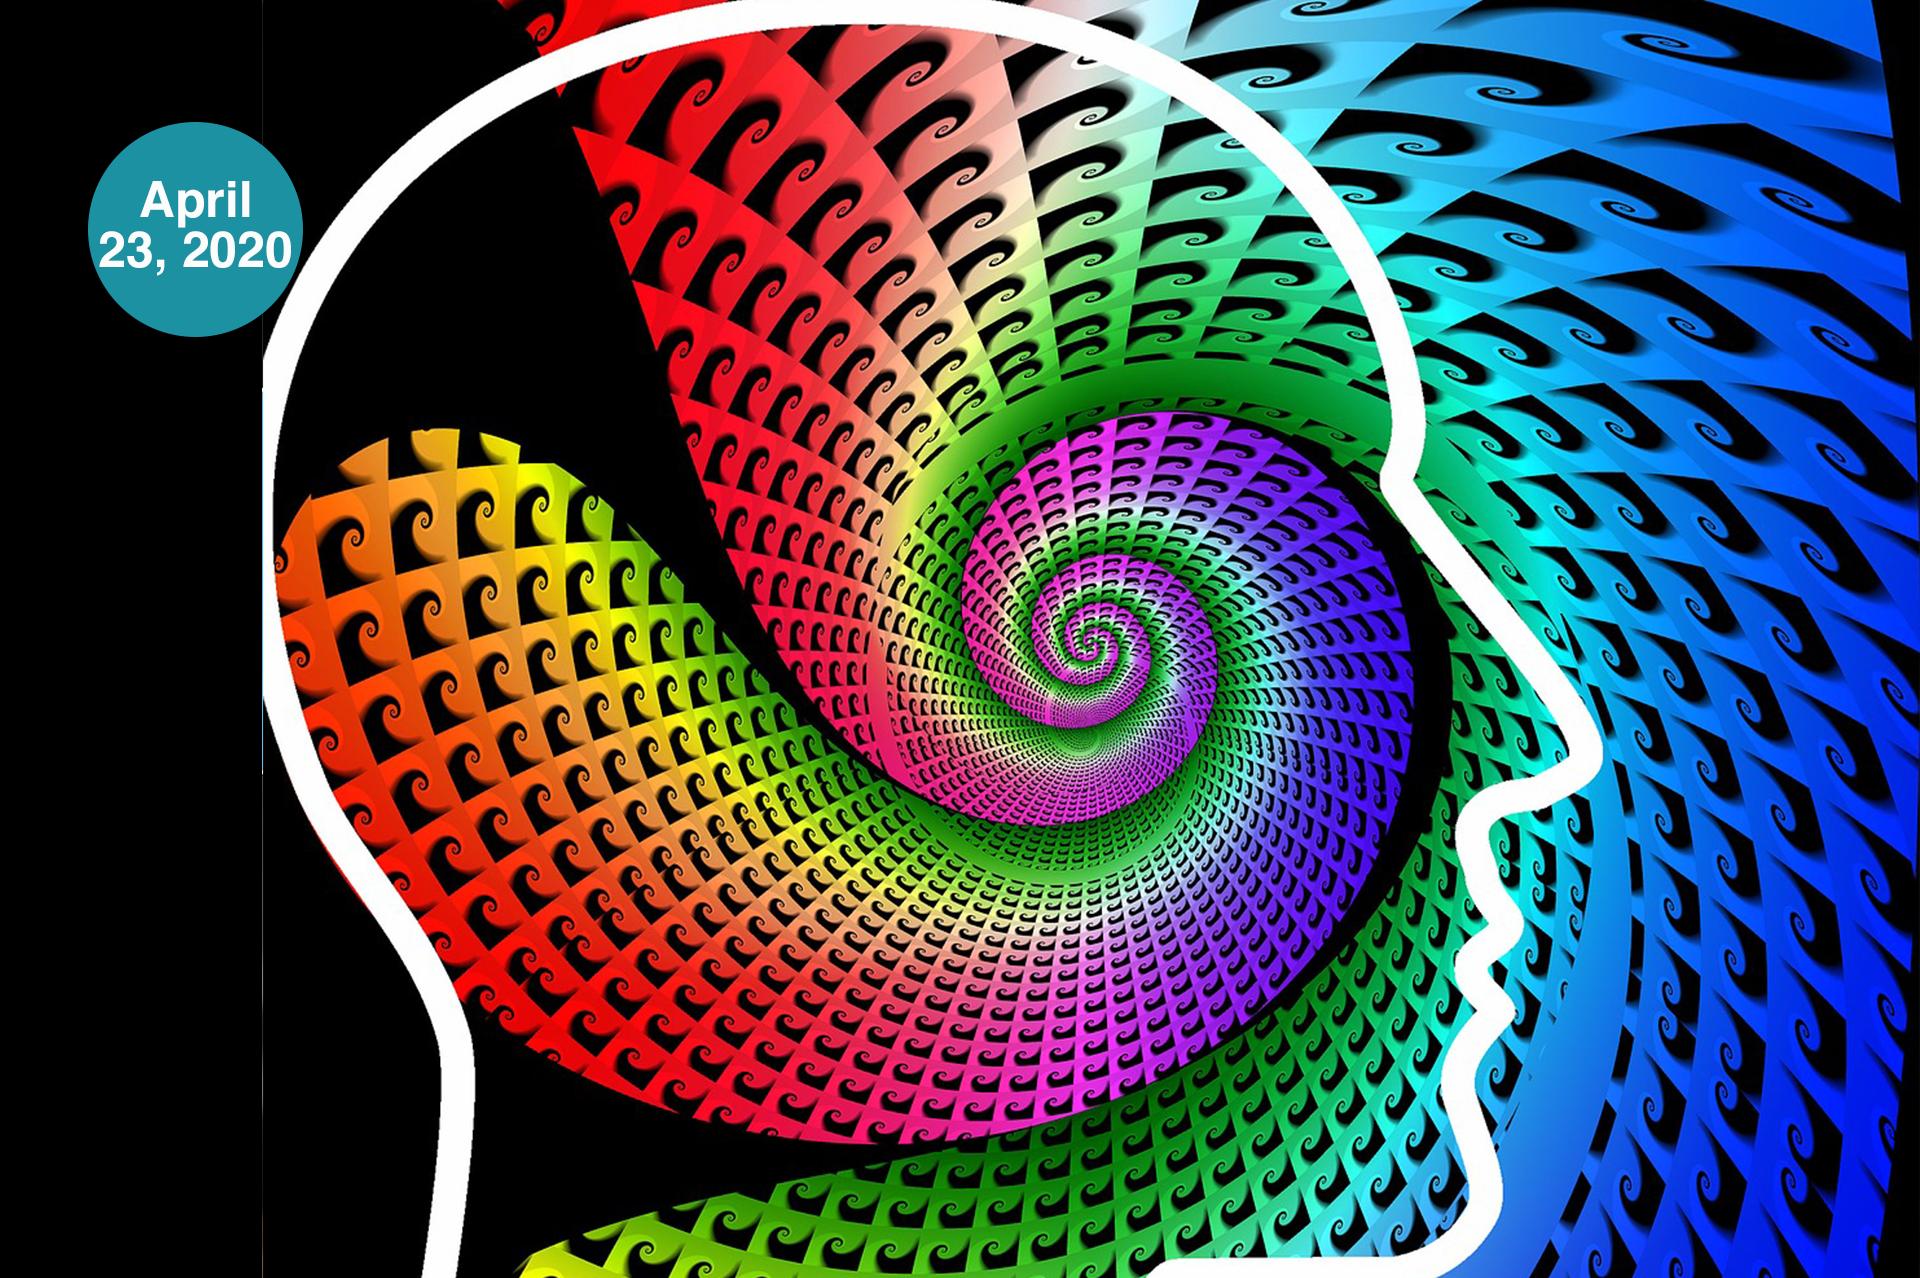 spiral thinking image